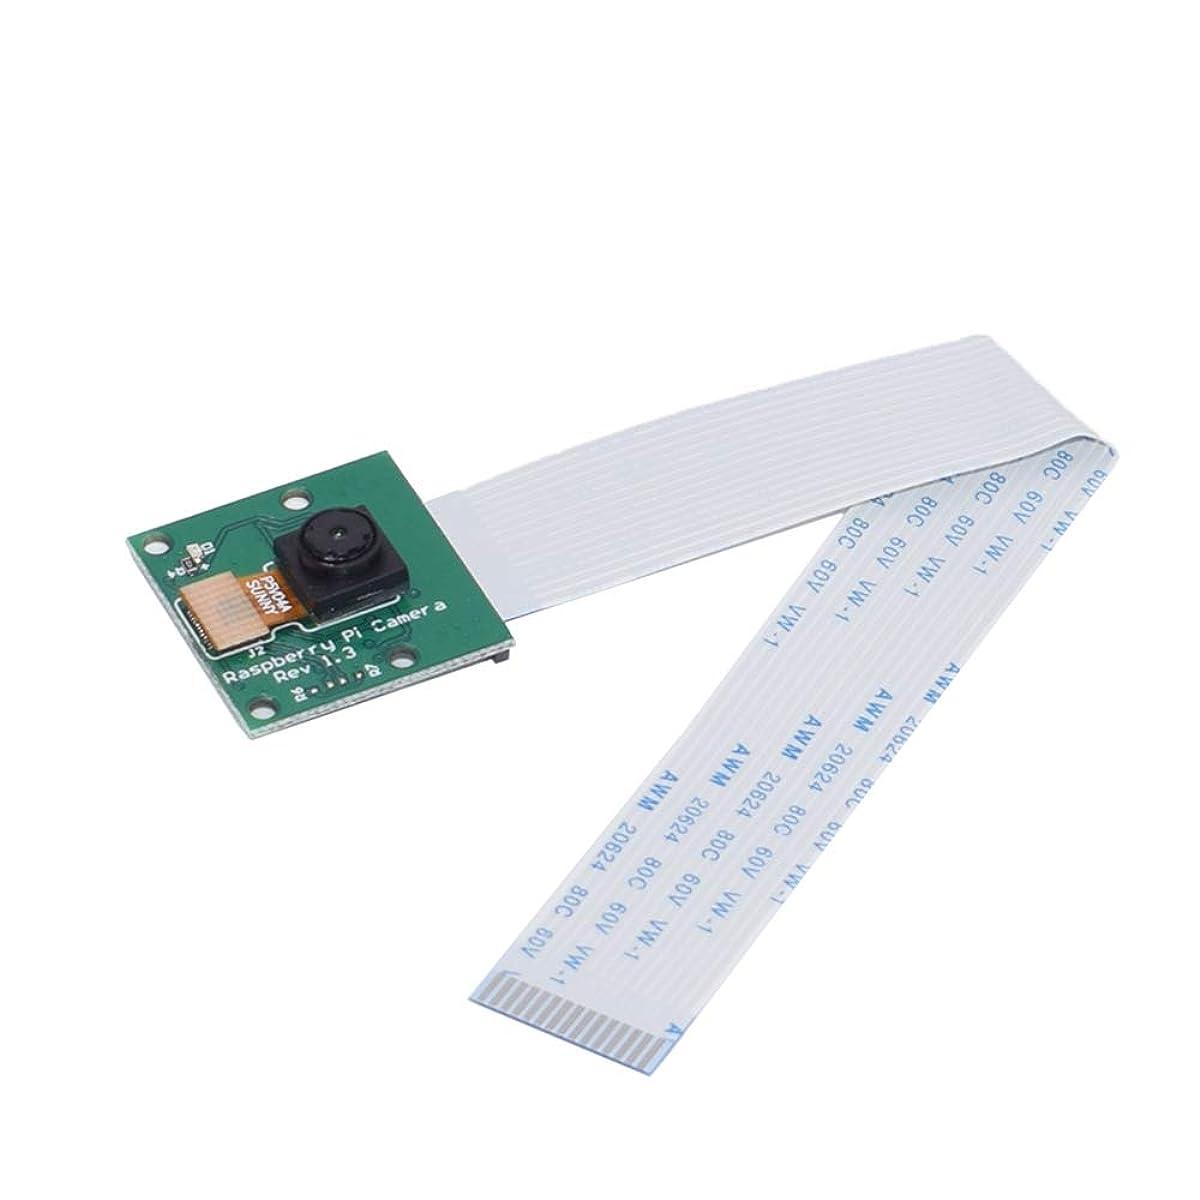 XM electronic 5 Megapixels 1080p Sensor Mini Camera Video Module for Raspberry Pi Model A/B/B+, Pi 2 and Raspberry Pi 3,3B+ with Flexcable